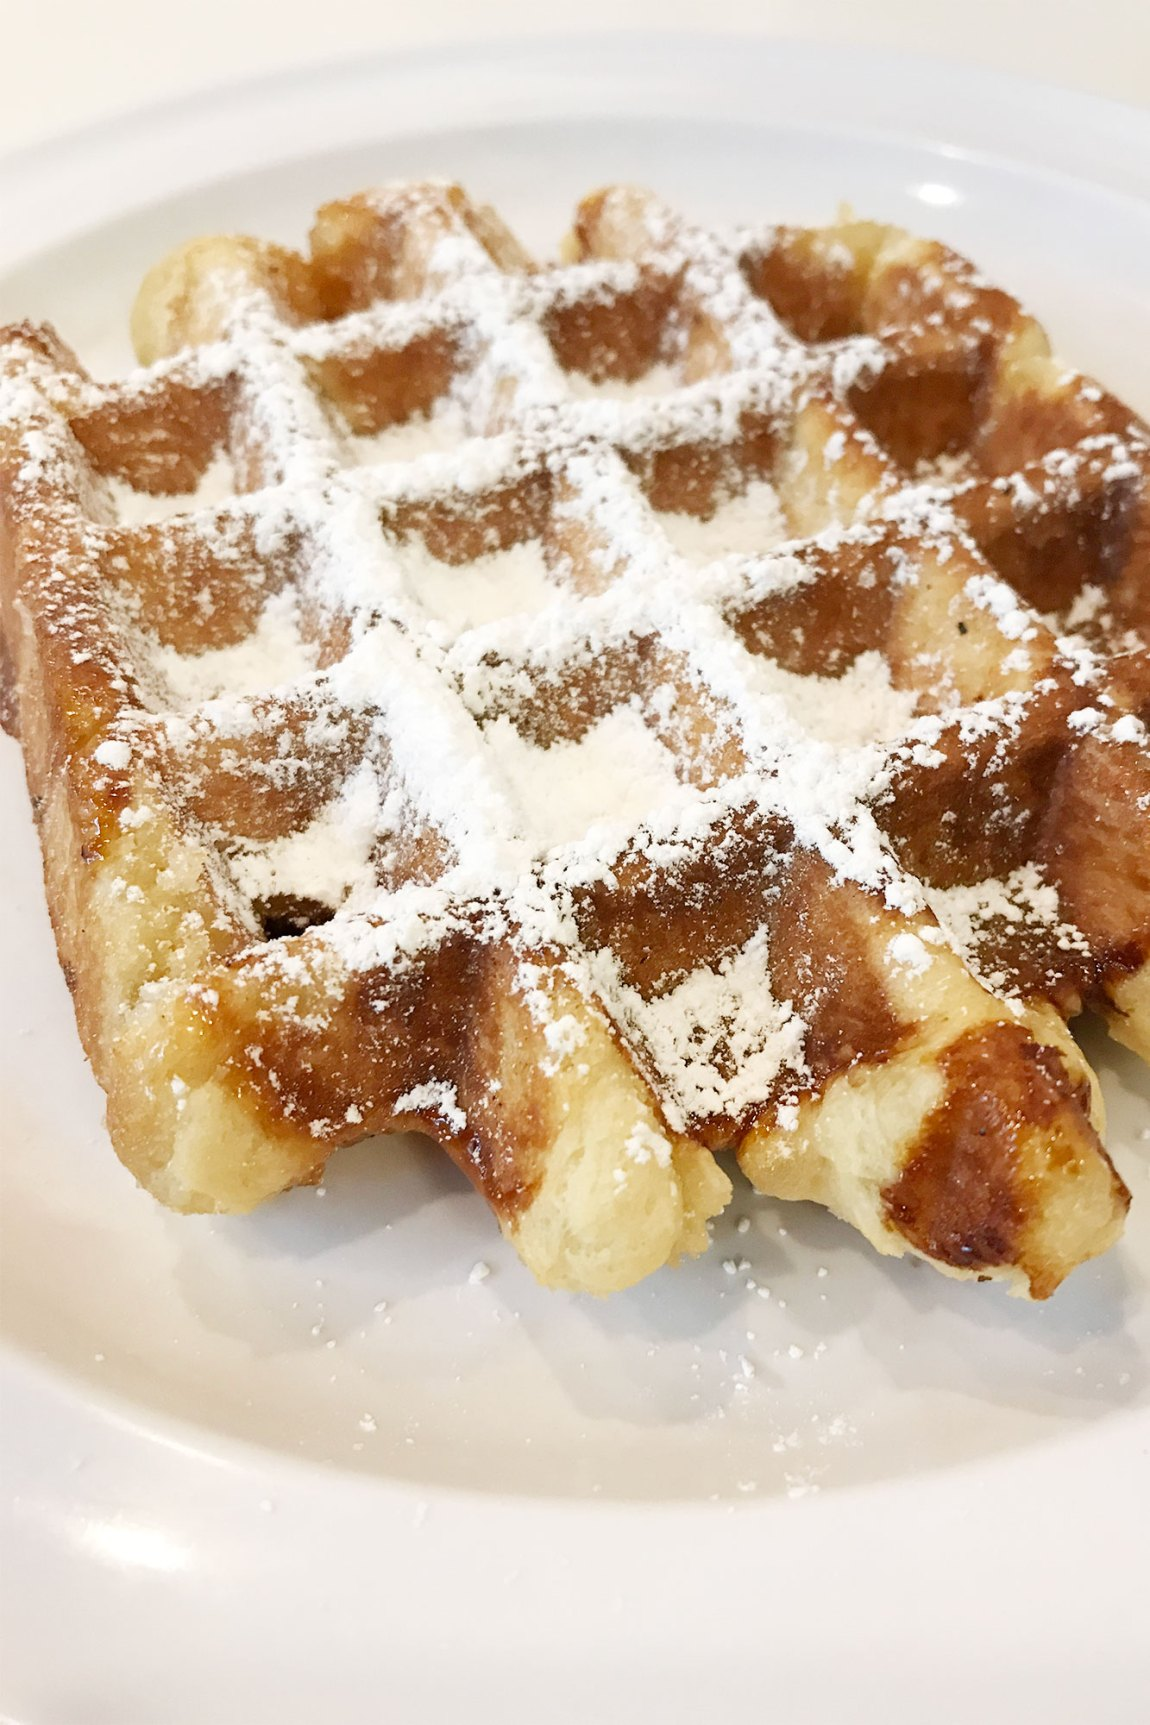 Liege waffle with powdered sugar